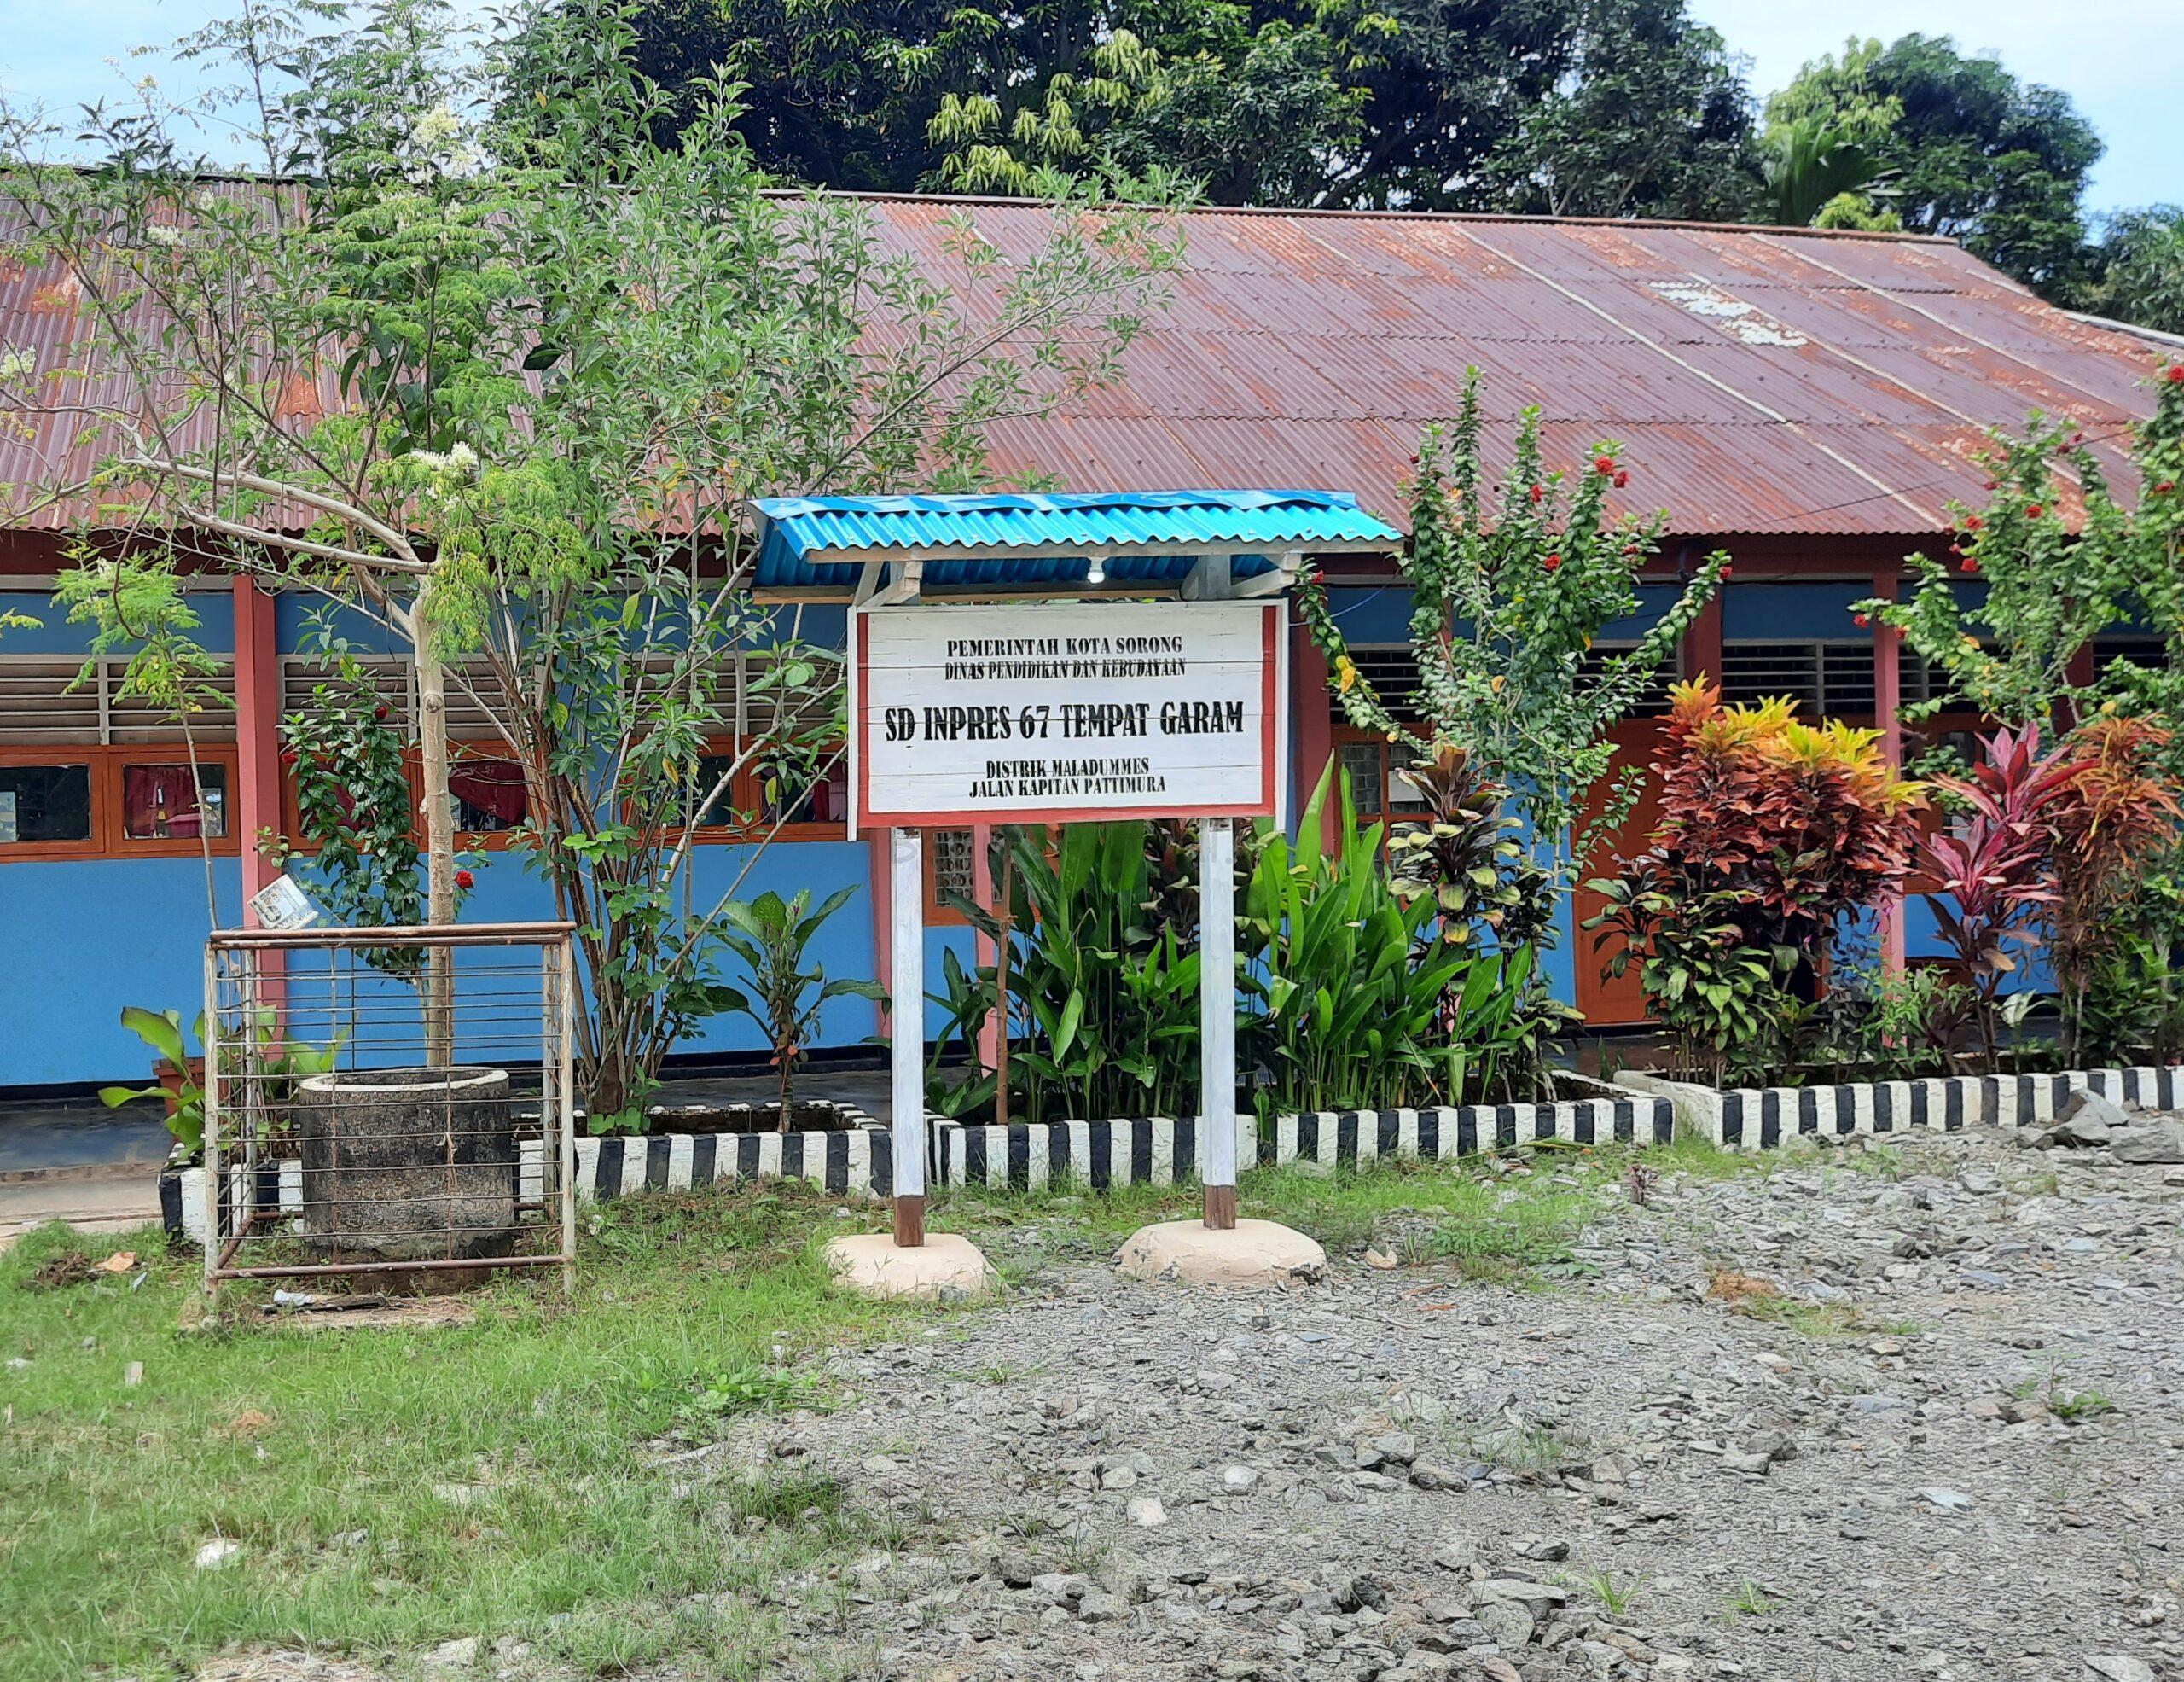 3 Sekolah di Kota Sorong Dapat Bantuan Puluhan Alat TIK Melalui Usulan Rico Sia 4 20201021 213452 scaled